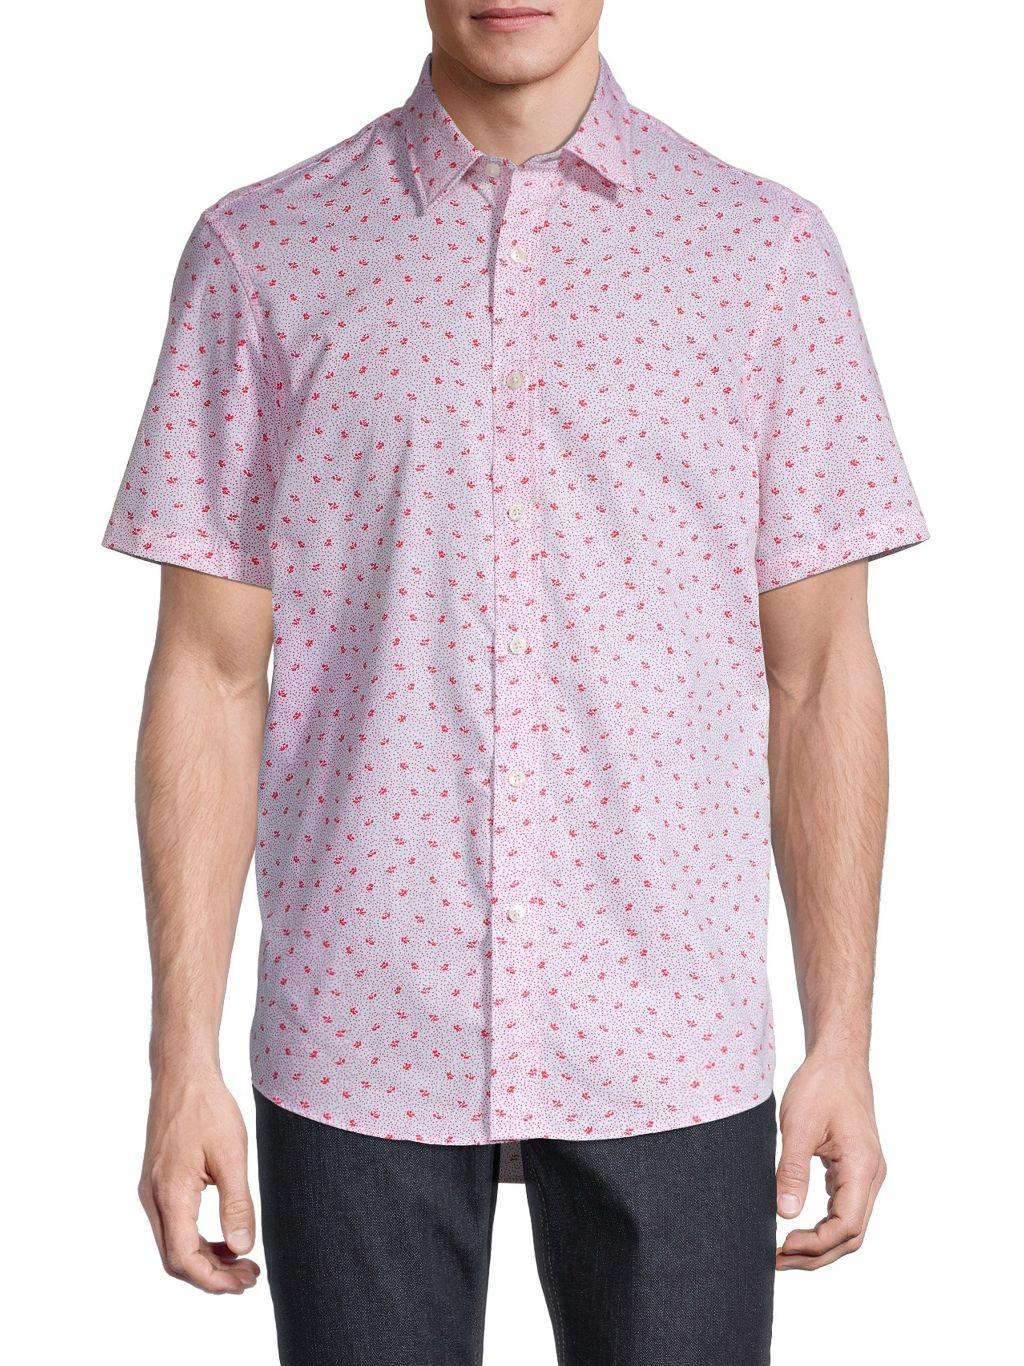 Michael Kors Amos Printed Short-Sleeve Shirt